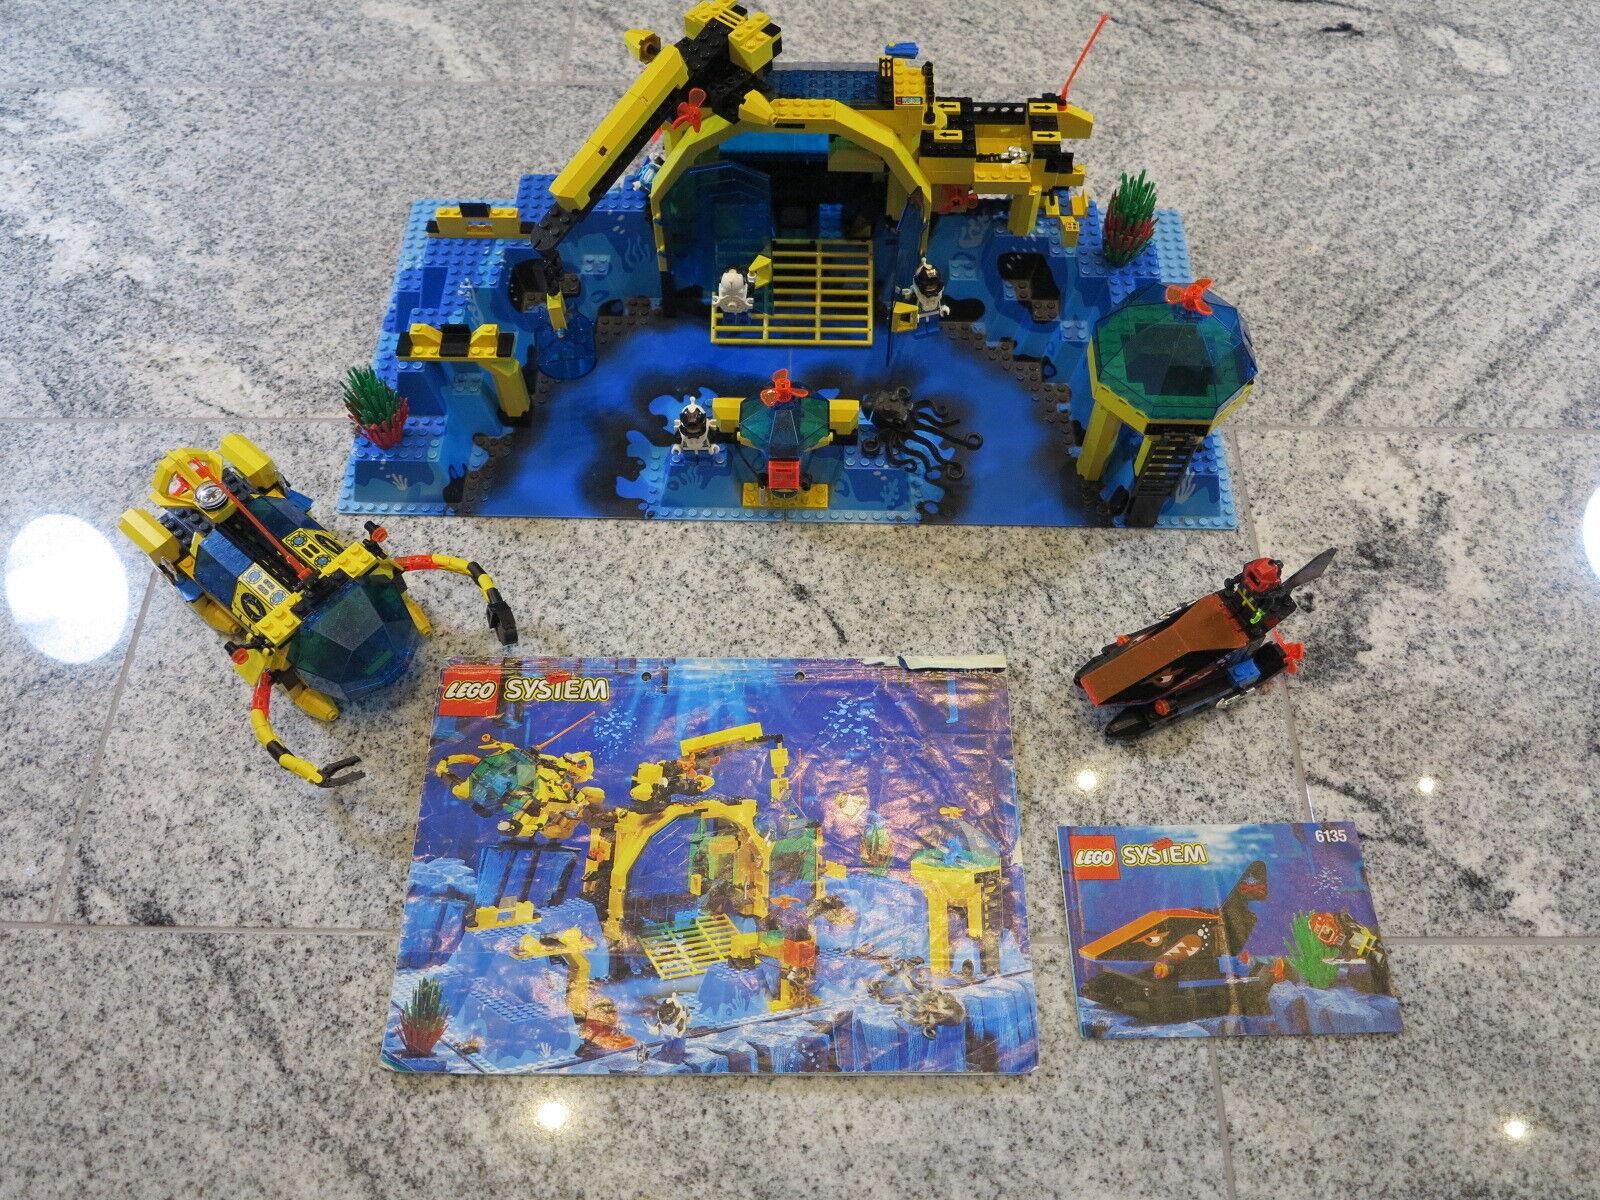 LEGO SYSTEM 6195+6135 Unterwasserstation Aquanauts Neptun Discovery 3D + OBA